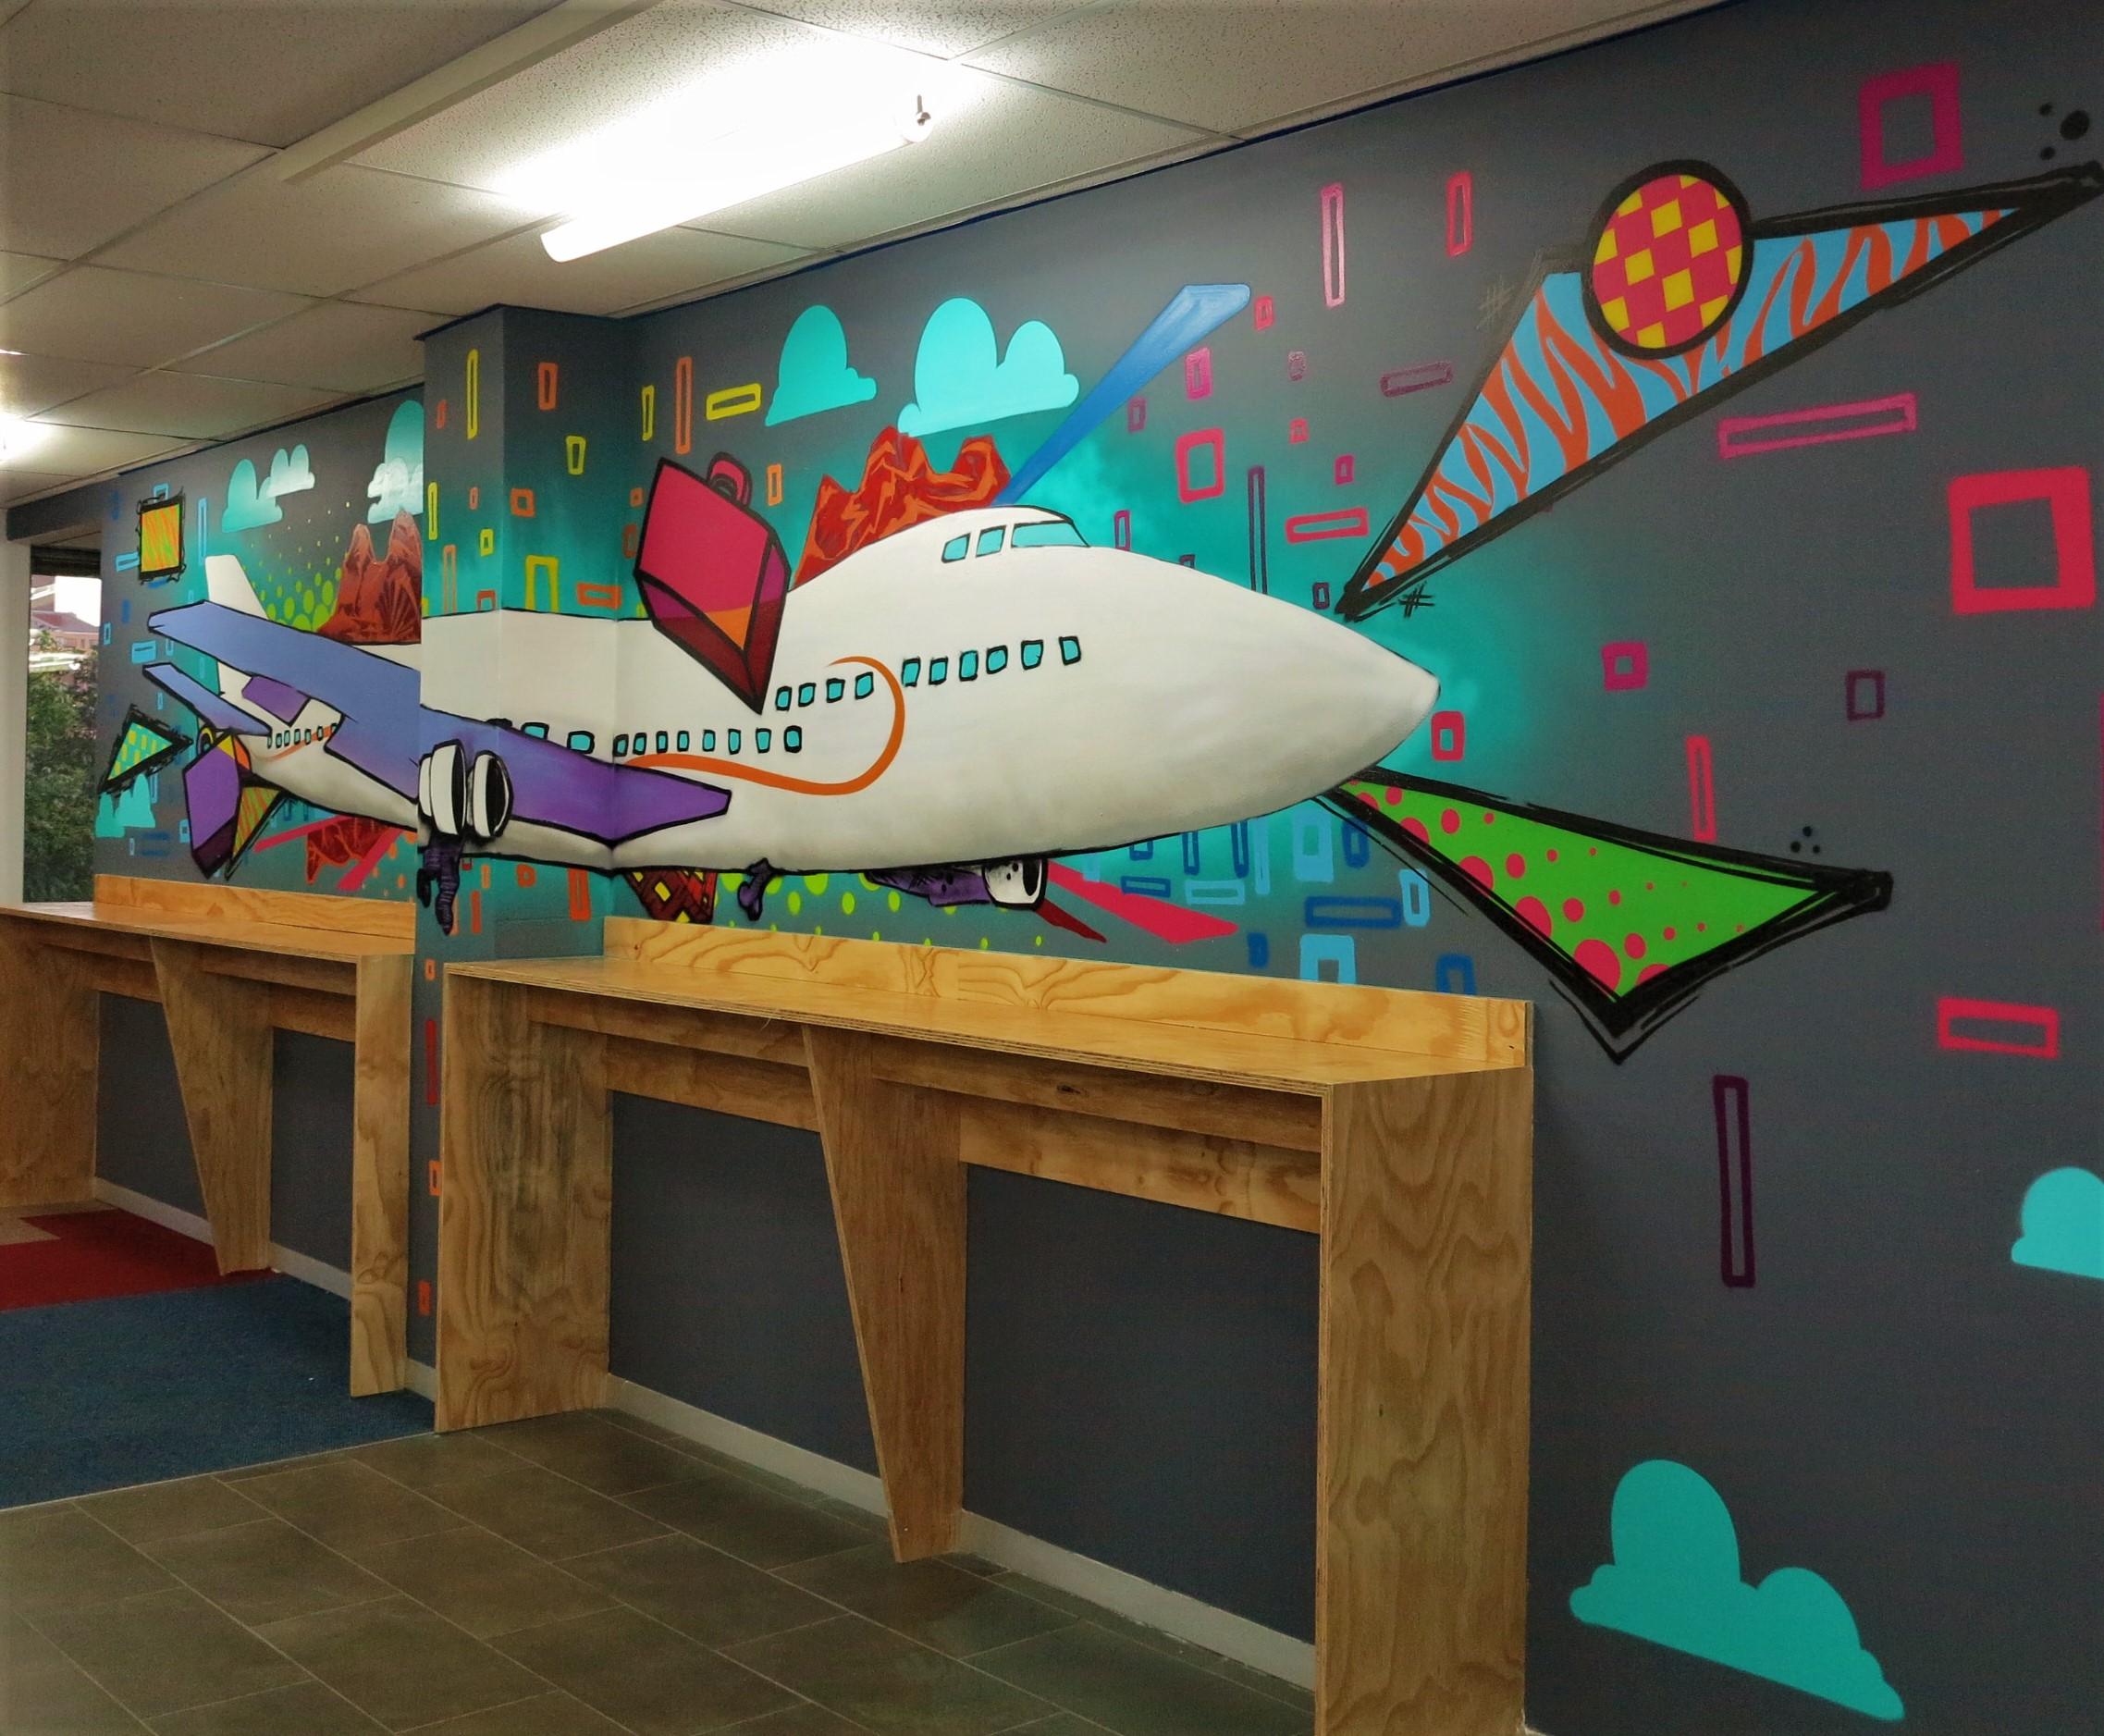 graffiti office mural for SAA call center canteen